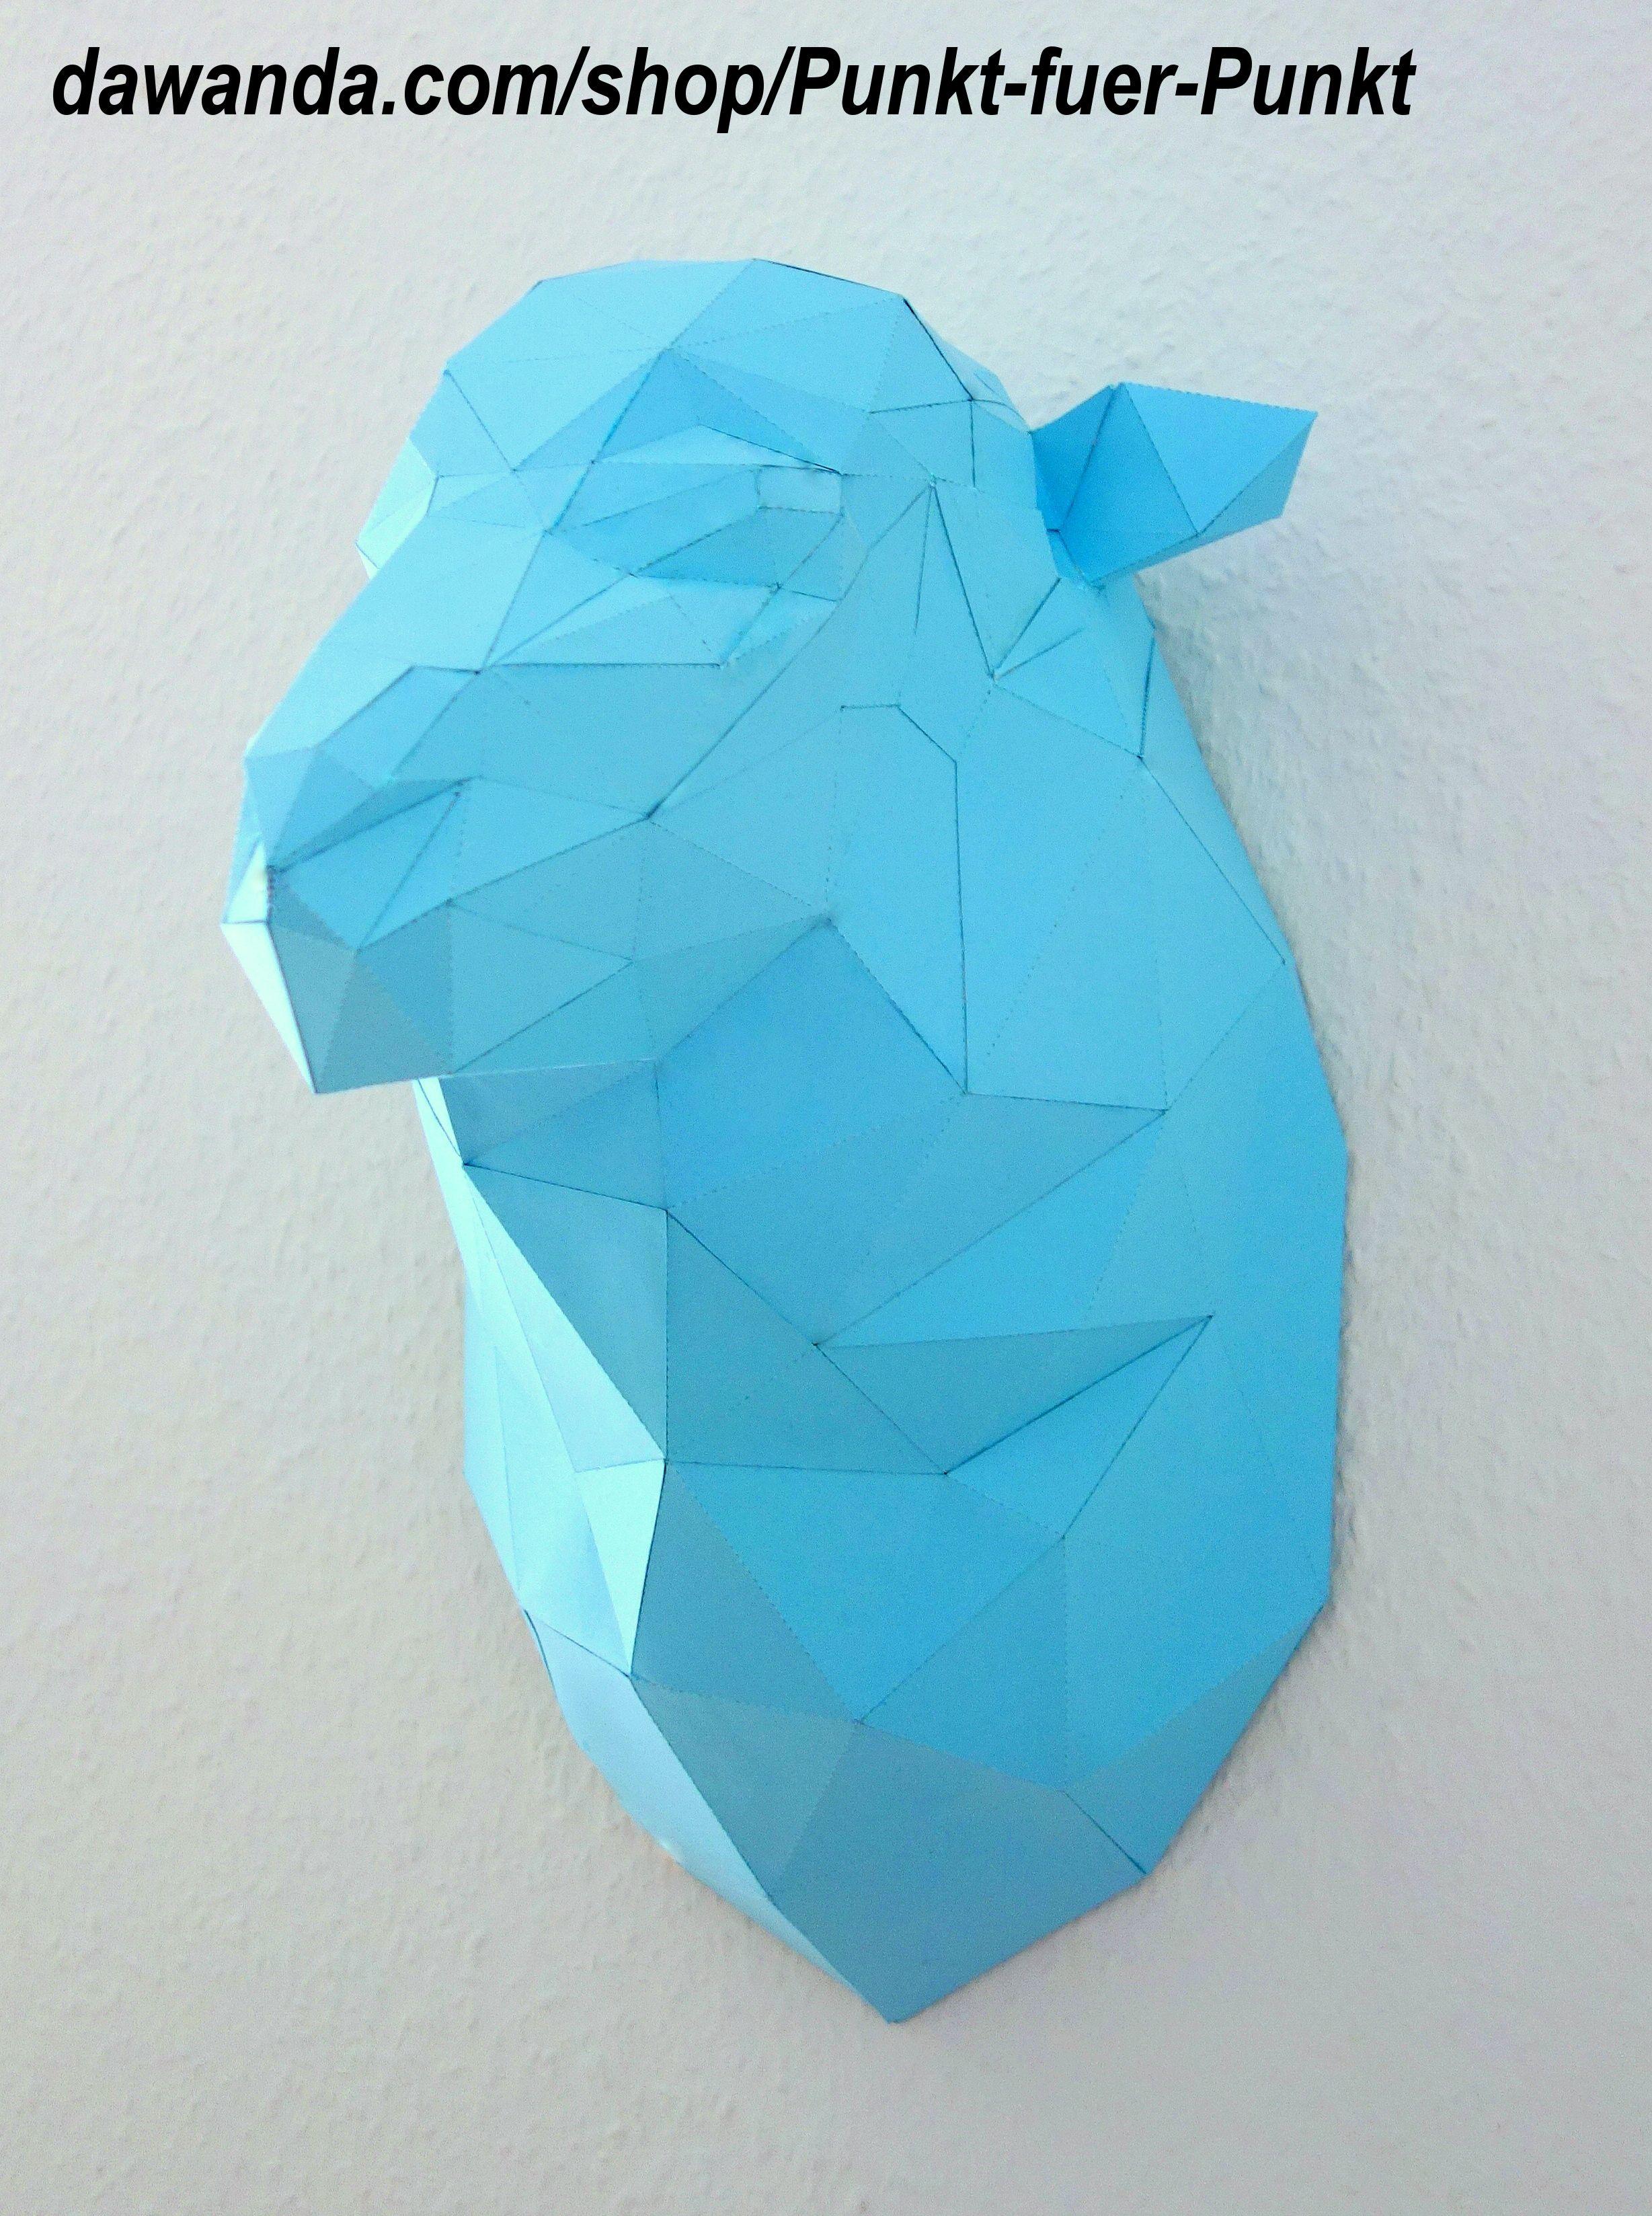 Sheep diy do it yourself papercraft papertrophy origami wallart sheep diy do it yourself papercraft papertrophy origami wallart design home solutioingenieria Choice Image